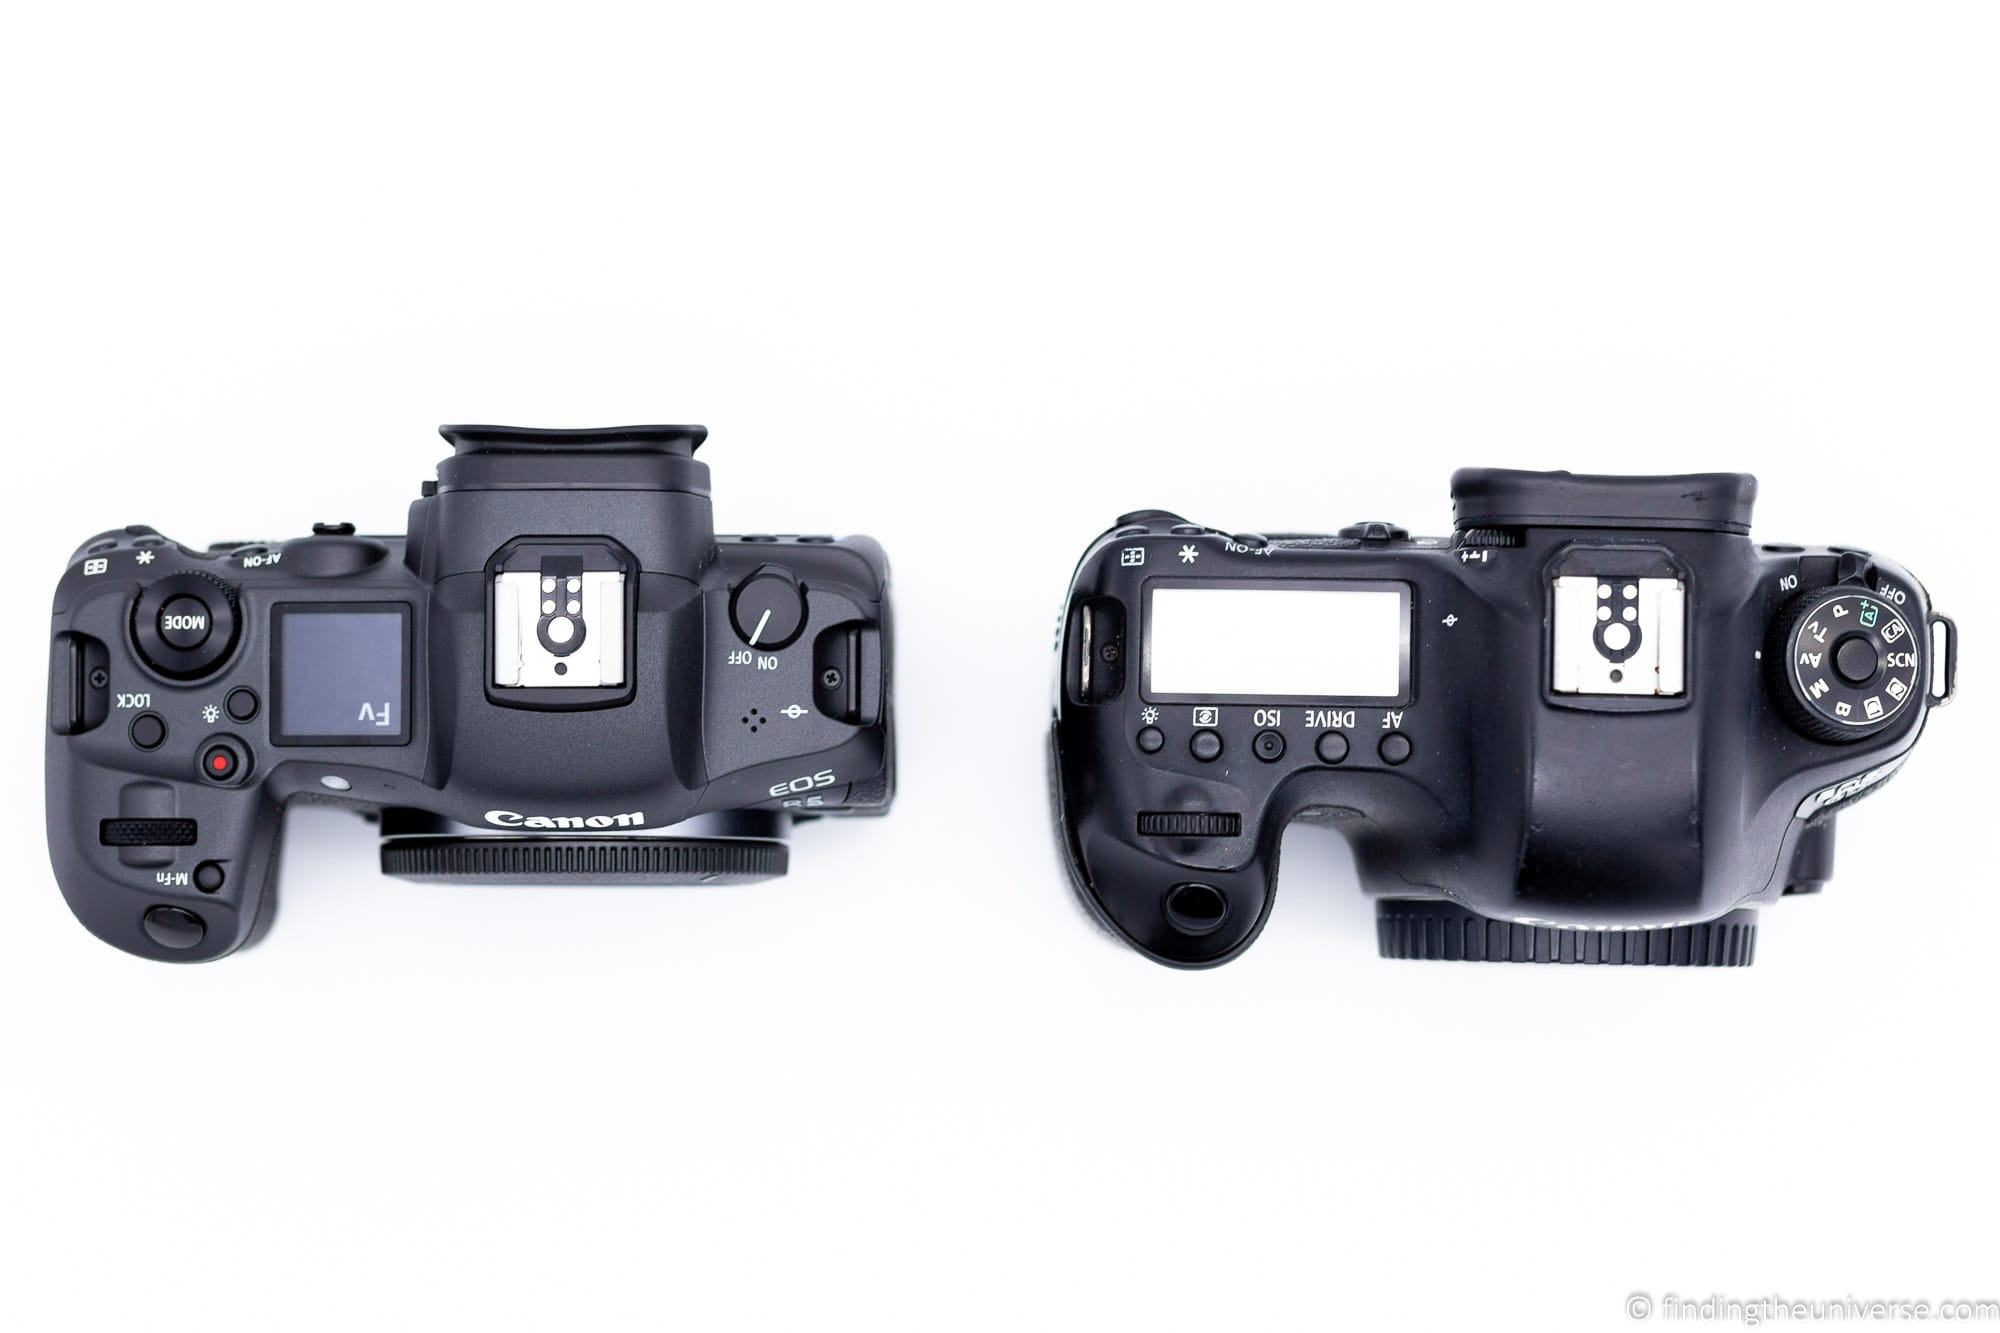 EOS R5 vs EOS 6D